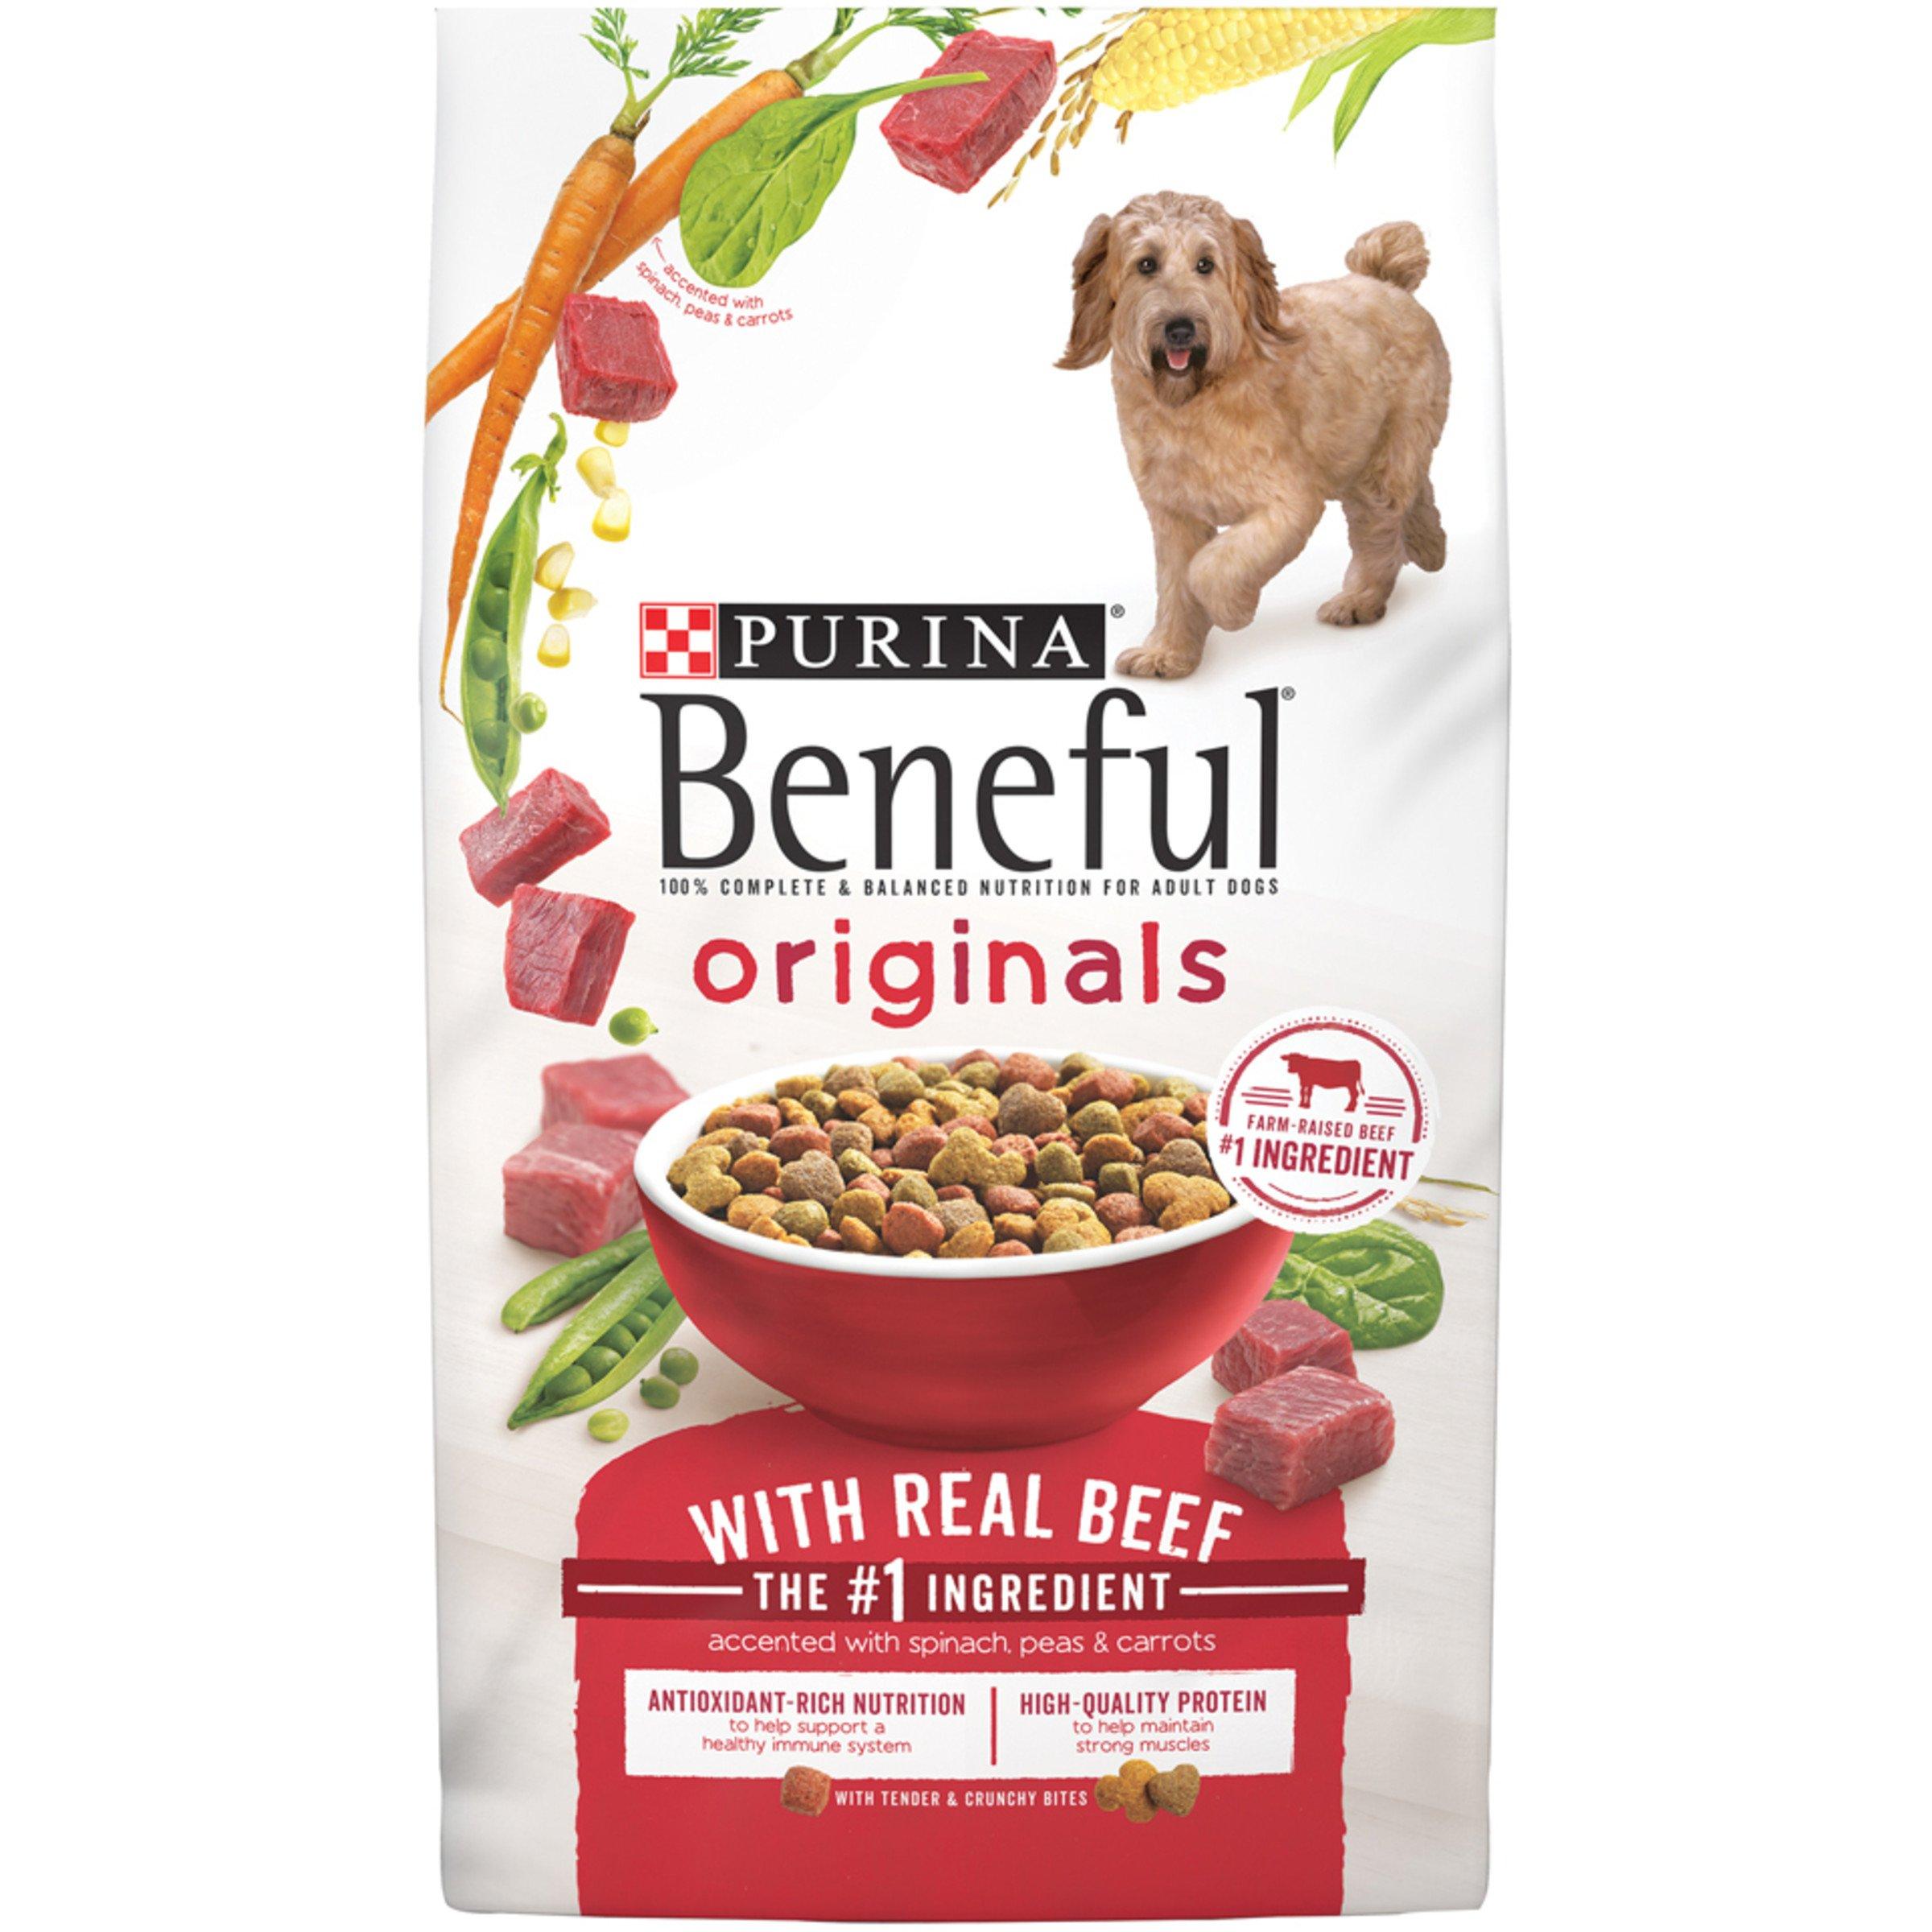 Purina Beneful Puppy Food, 15.5 lb: Amazon.com: Grocery